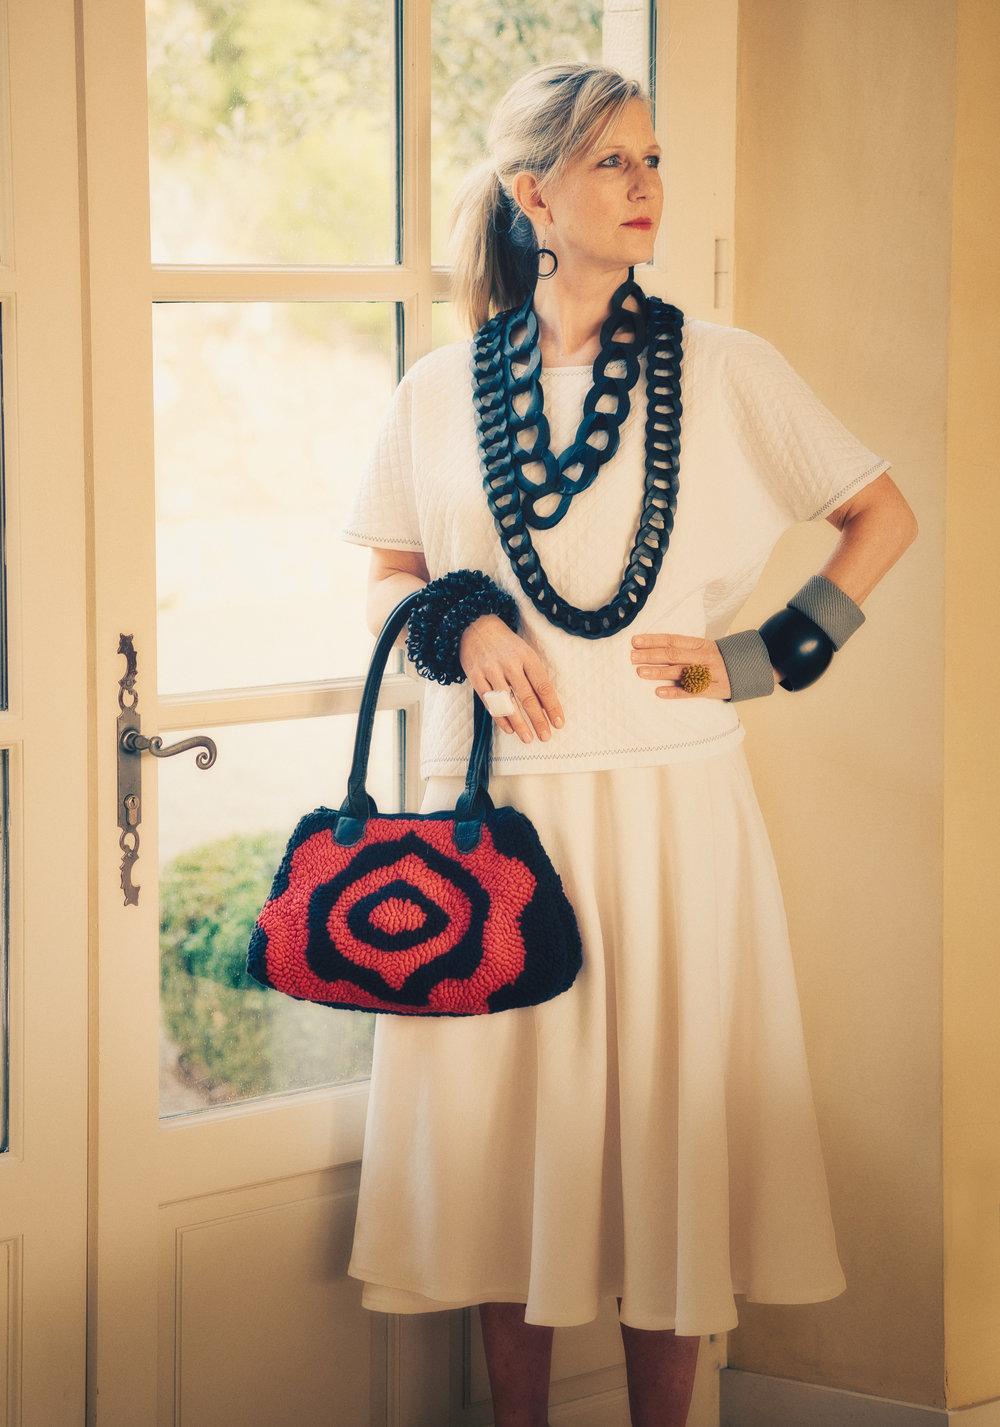 beverly-smart-fashion-spring-summer-2018-lagrasse (40).jpg